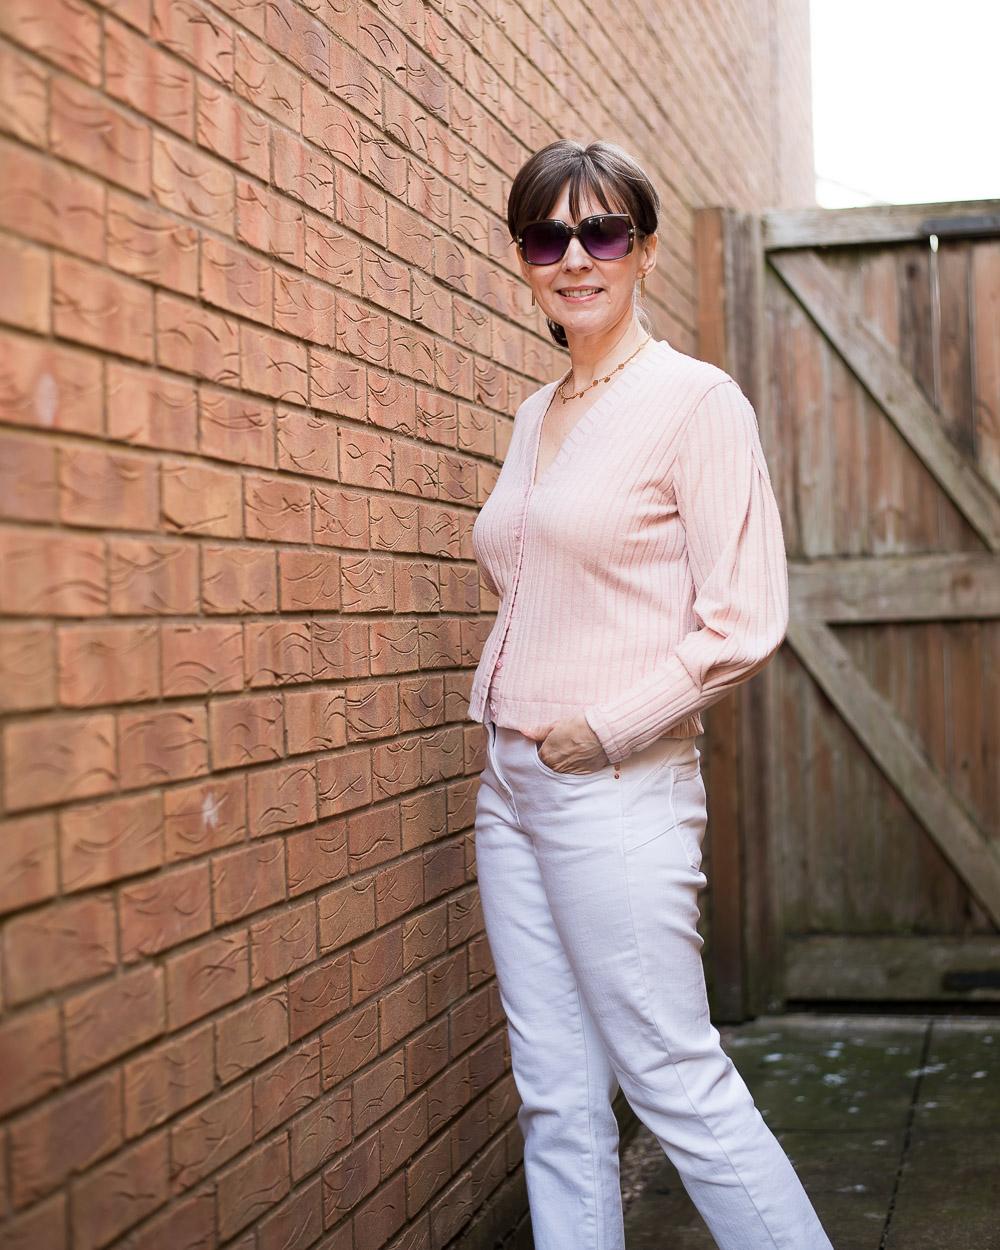 The joy of basics with a twist. Blush cardigan